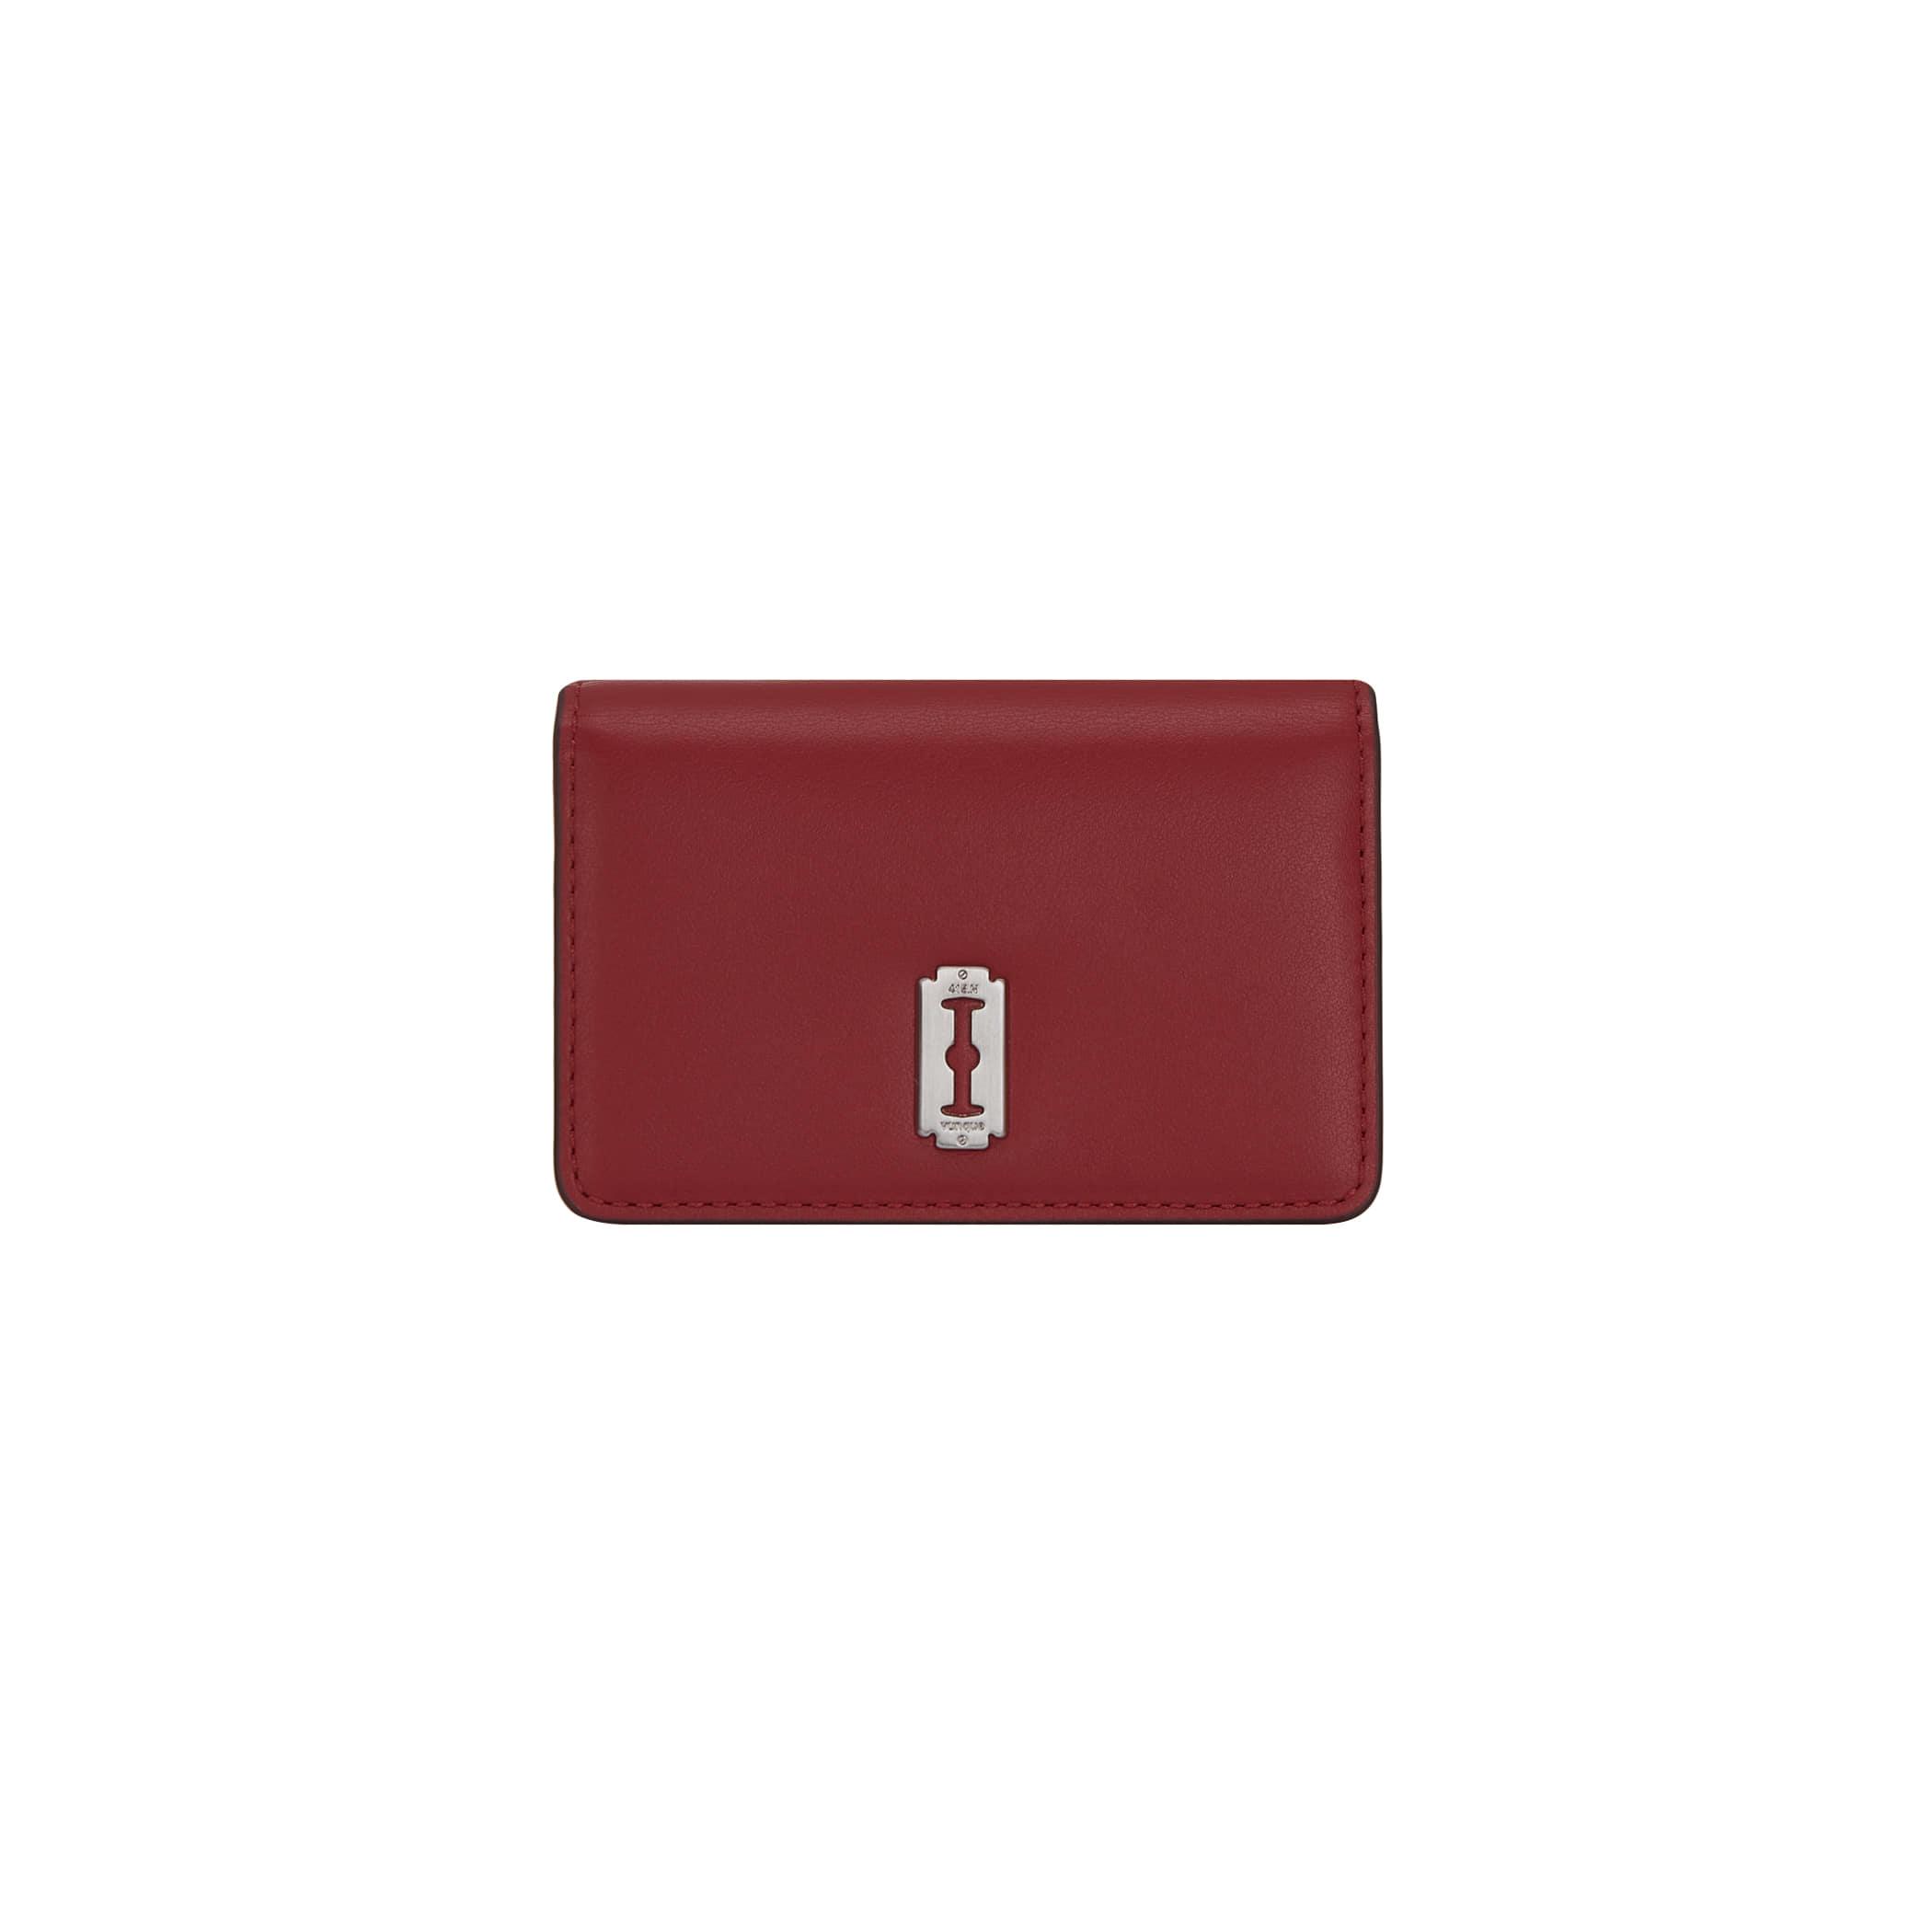 Perfec Essence Card wallet (퍼펙 에센스 카드지갑) Deep red